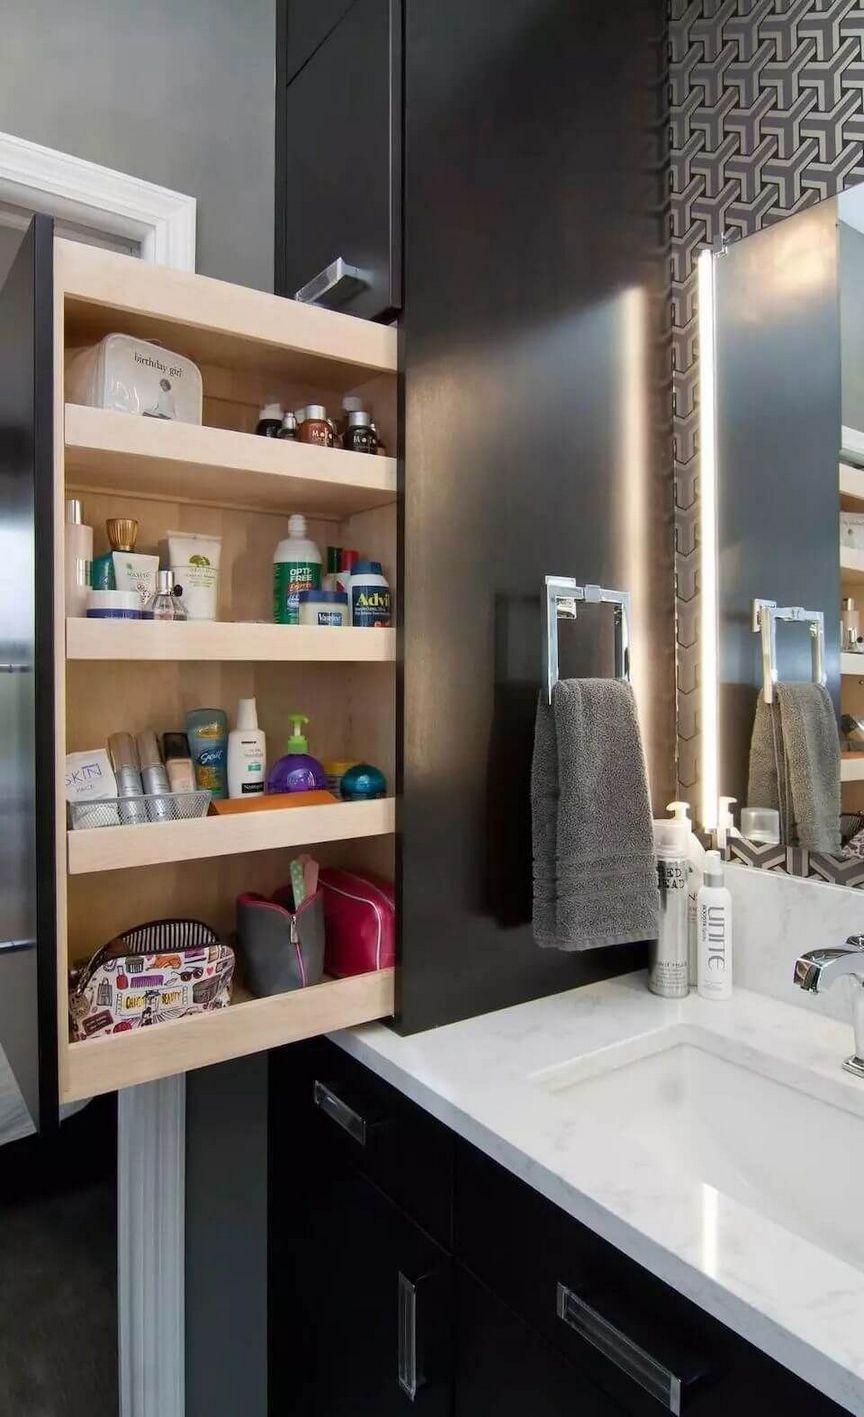 9 creative diy bathroom storage ideas for you | Badezimmer ...